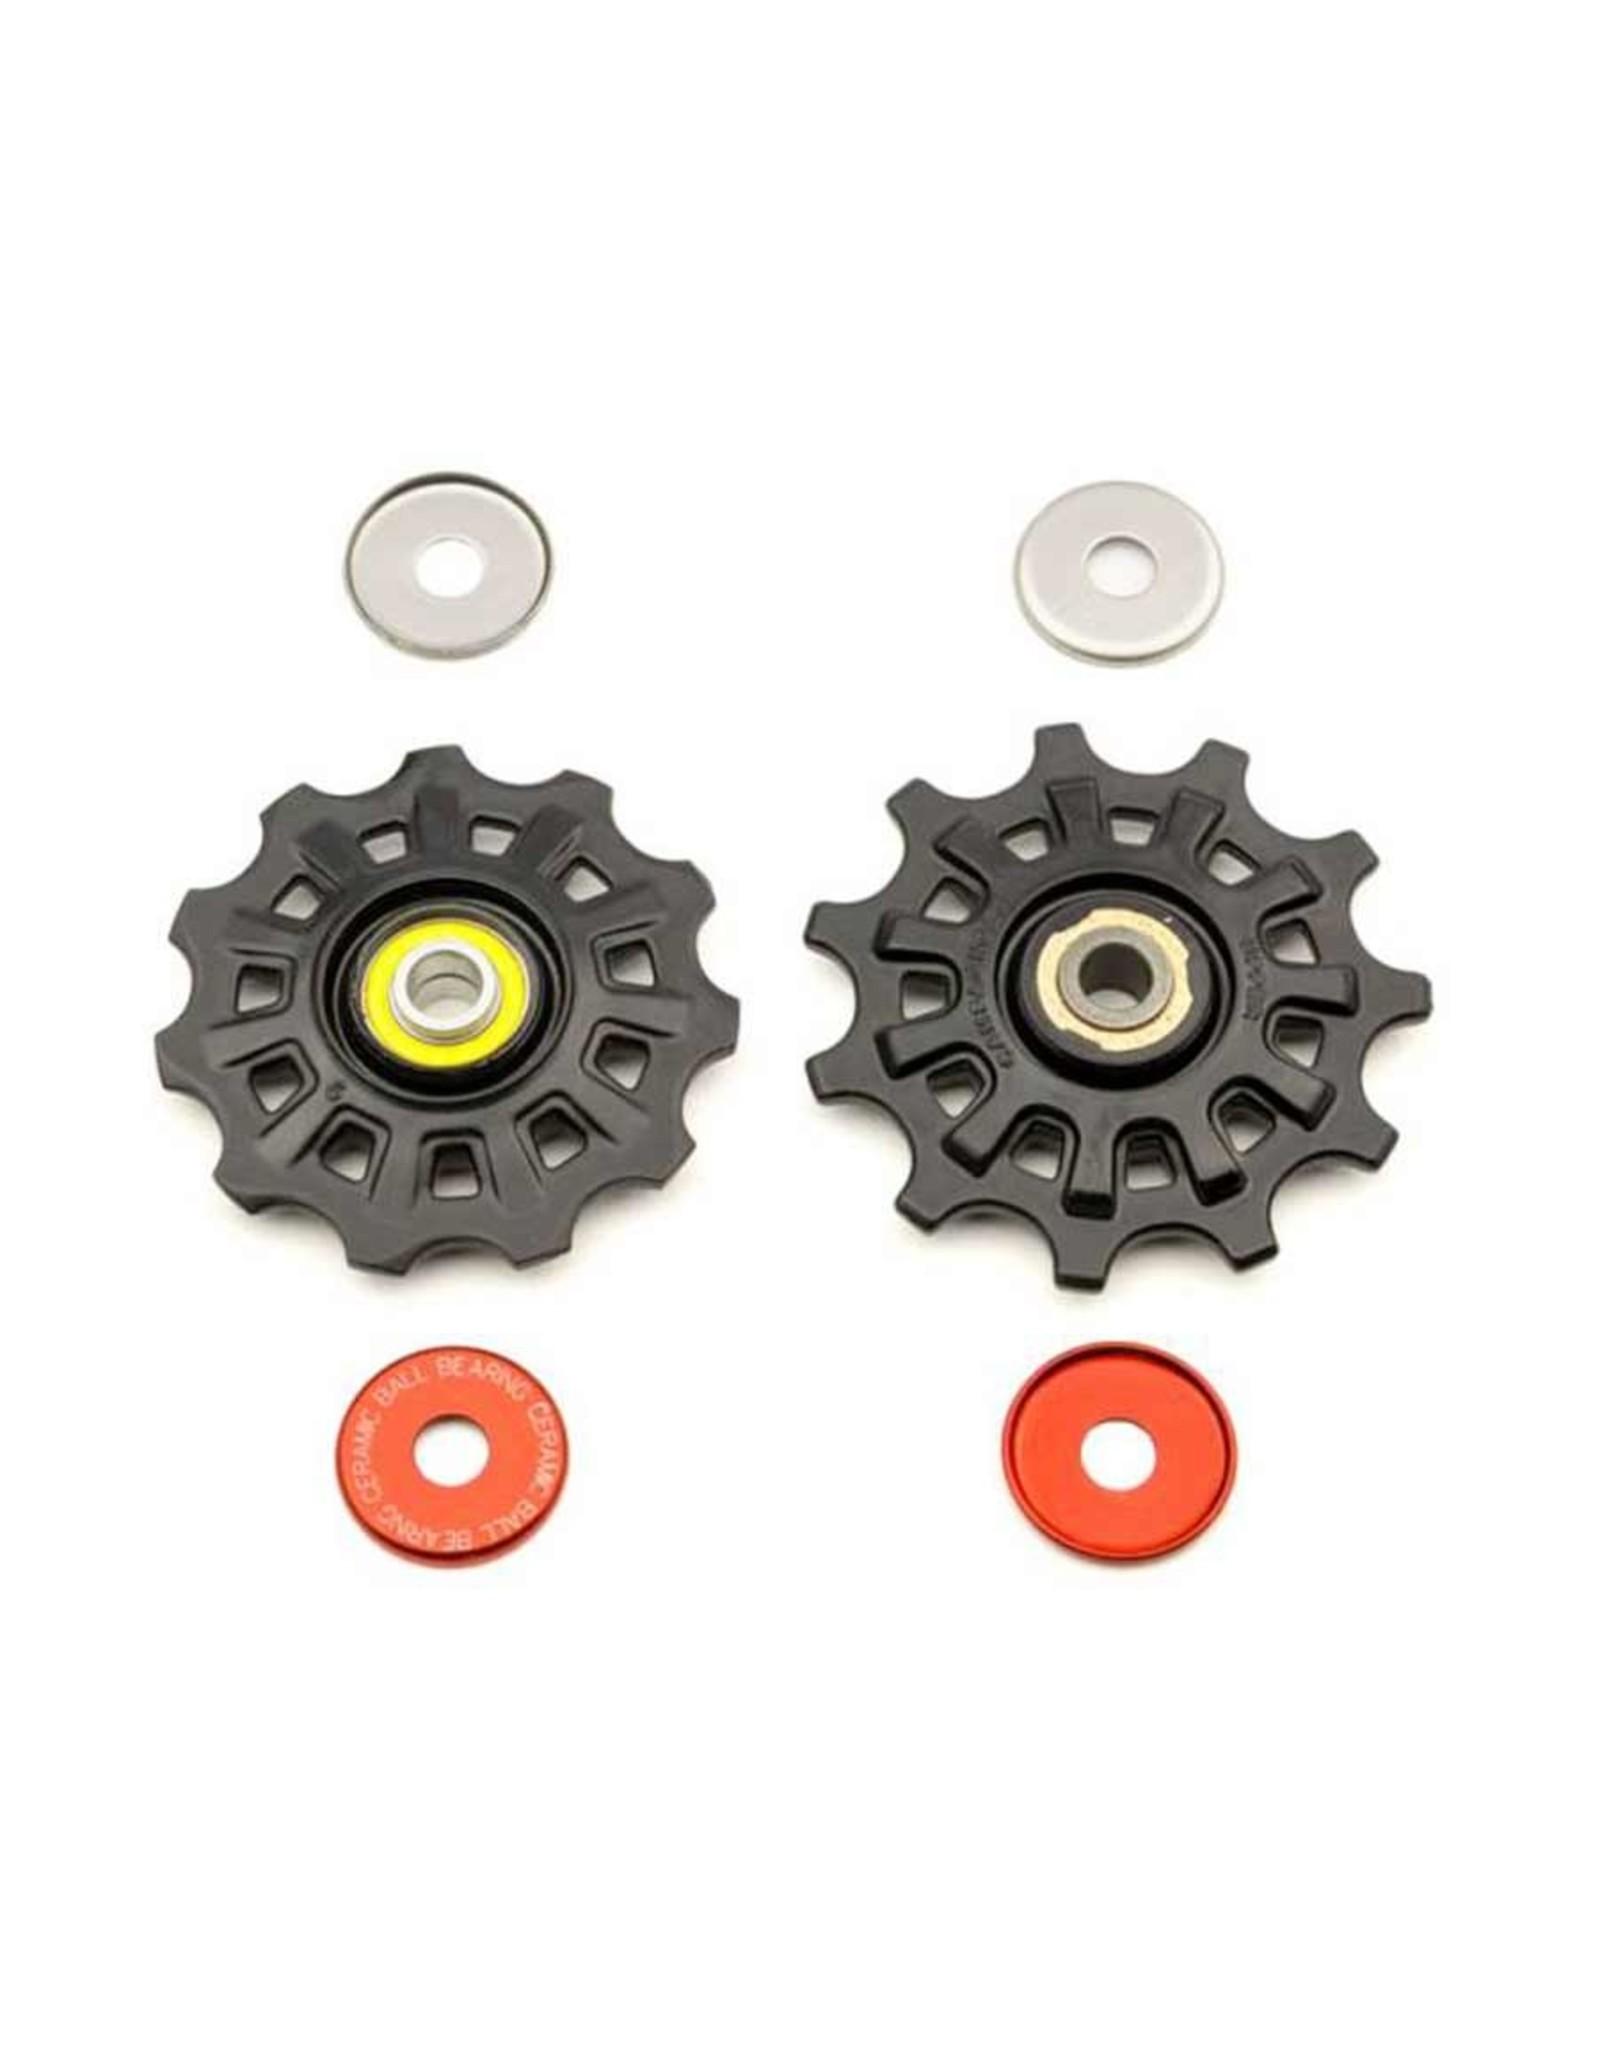 Campagnolo Campagnolo, RD-SR600, Pulleys, Ceramic bearings